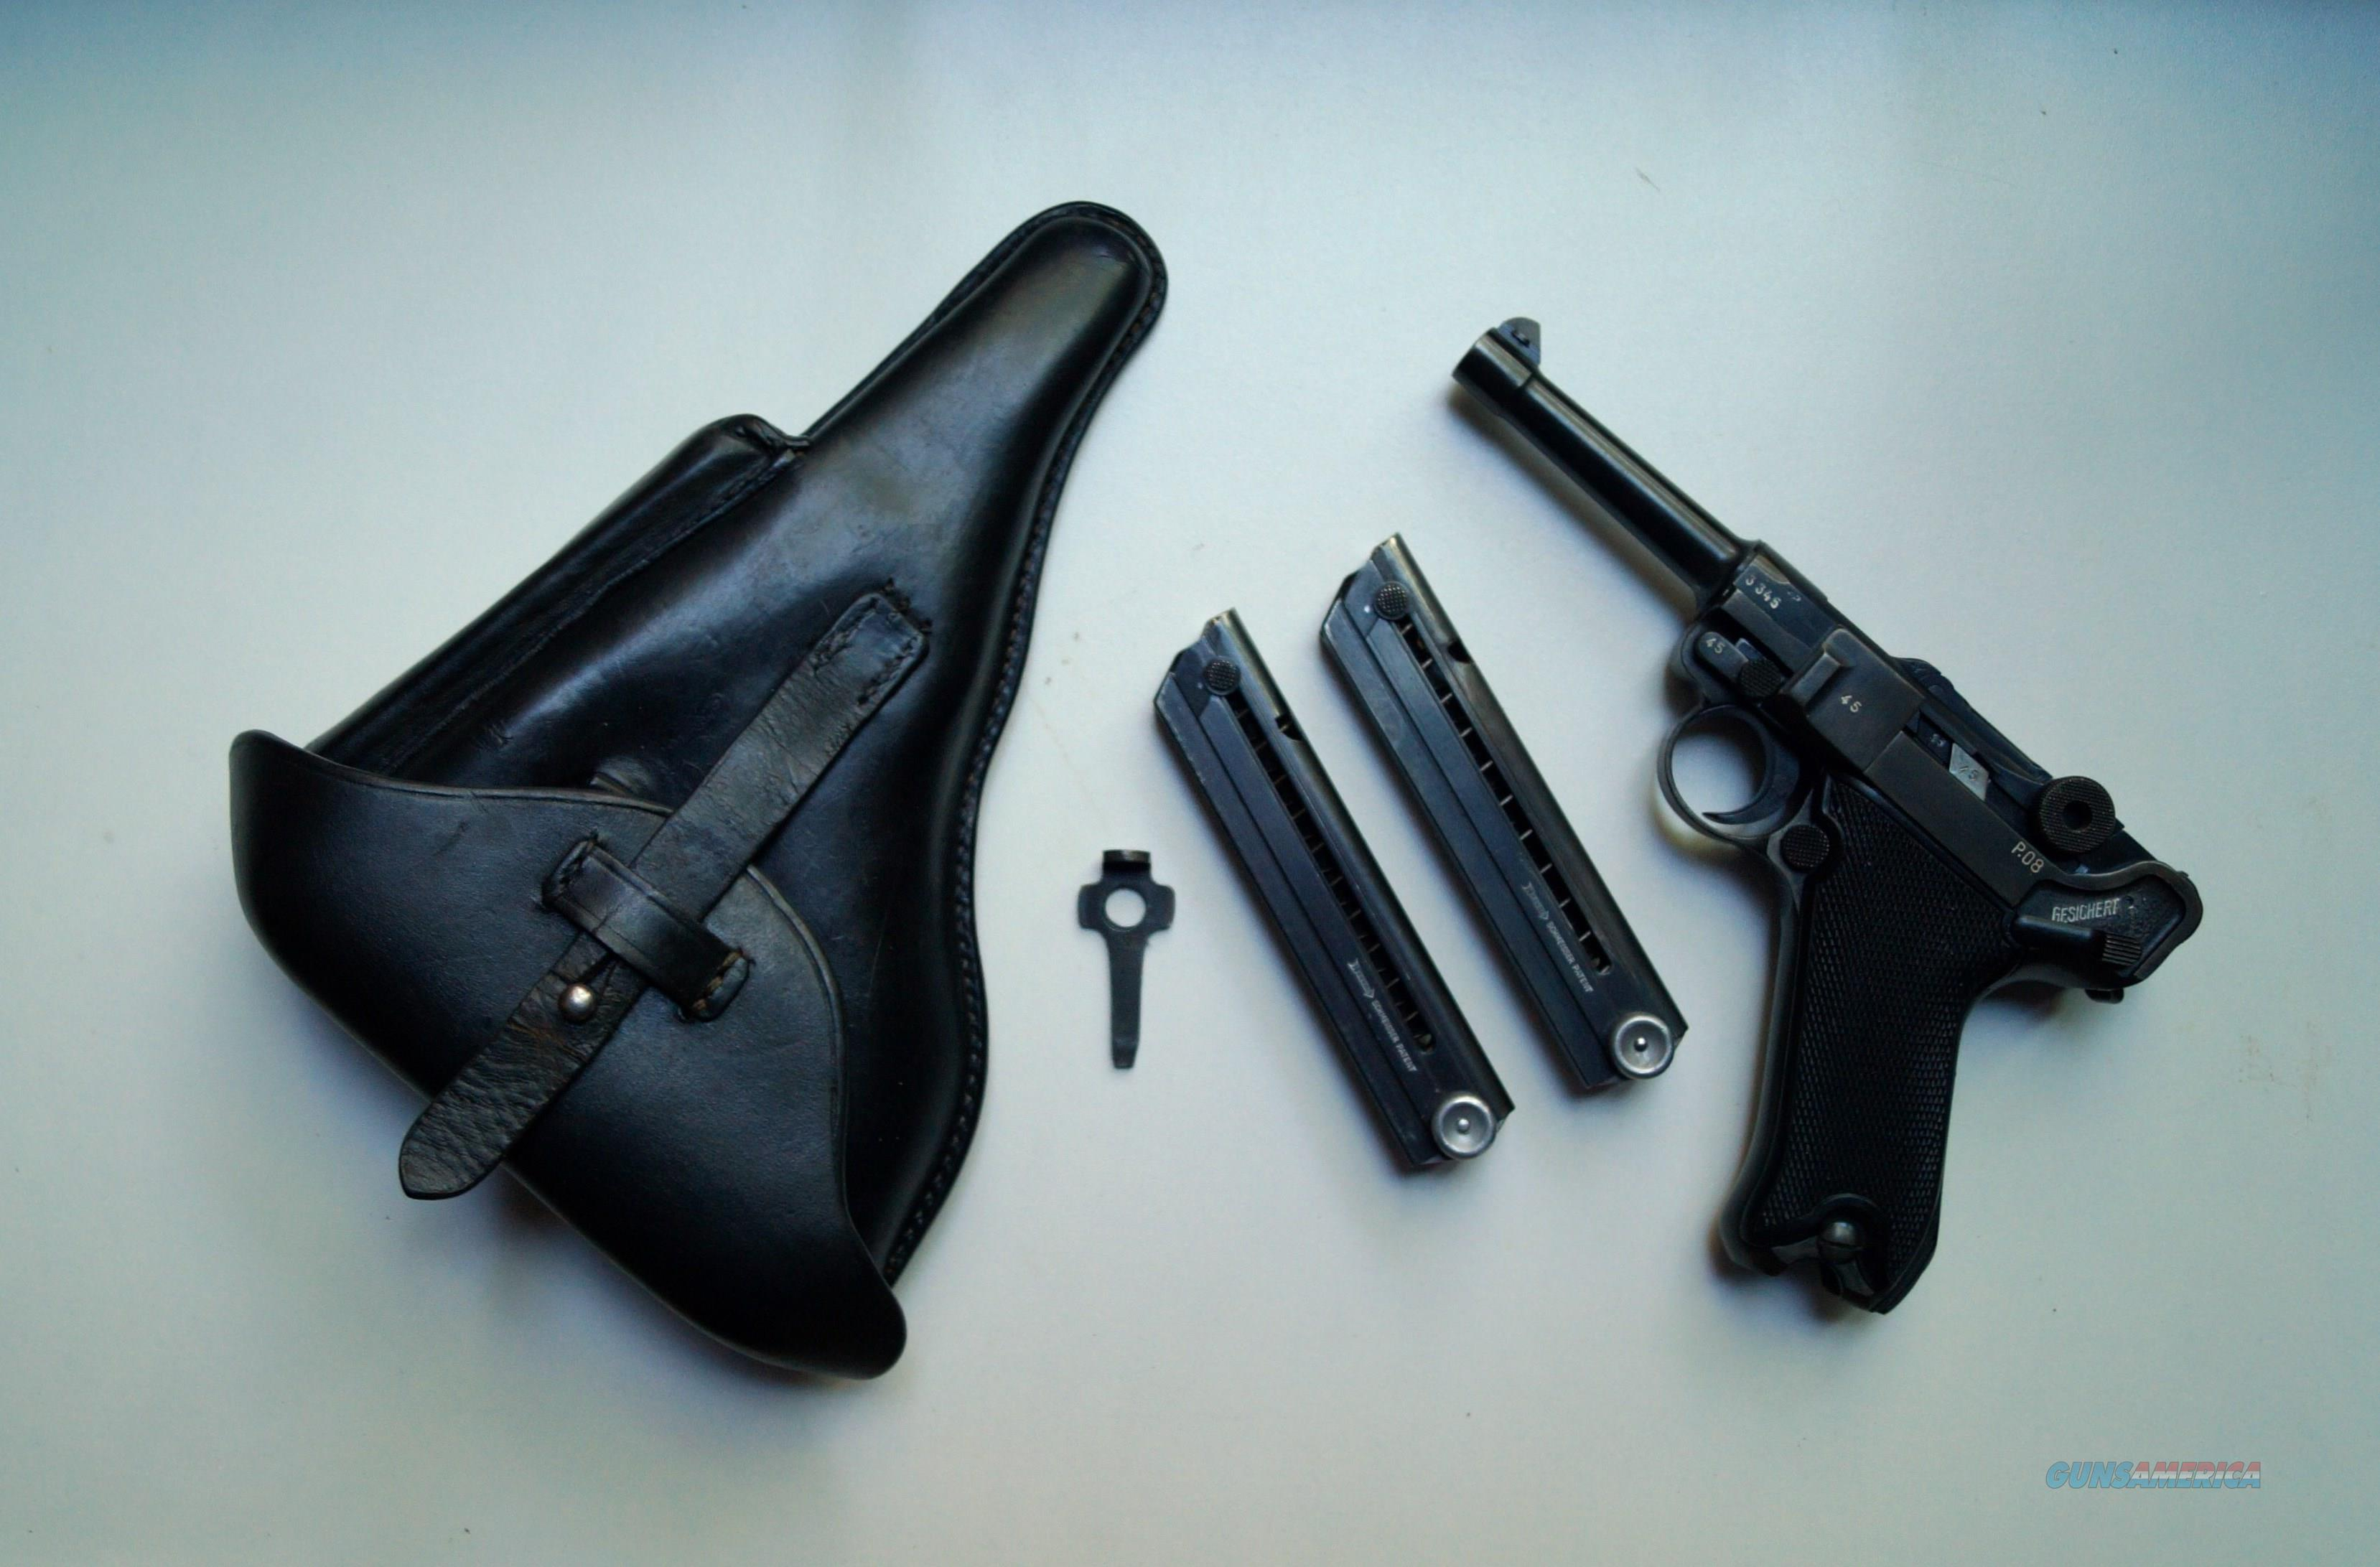 1942 MAUSER BANNER NAZI POLICE RIG  Guns > Pistols > Luger Pistols